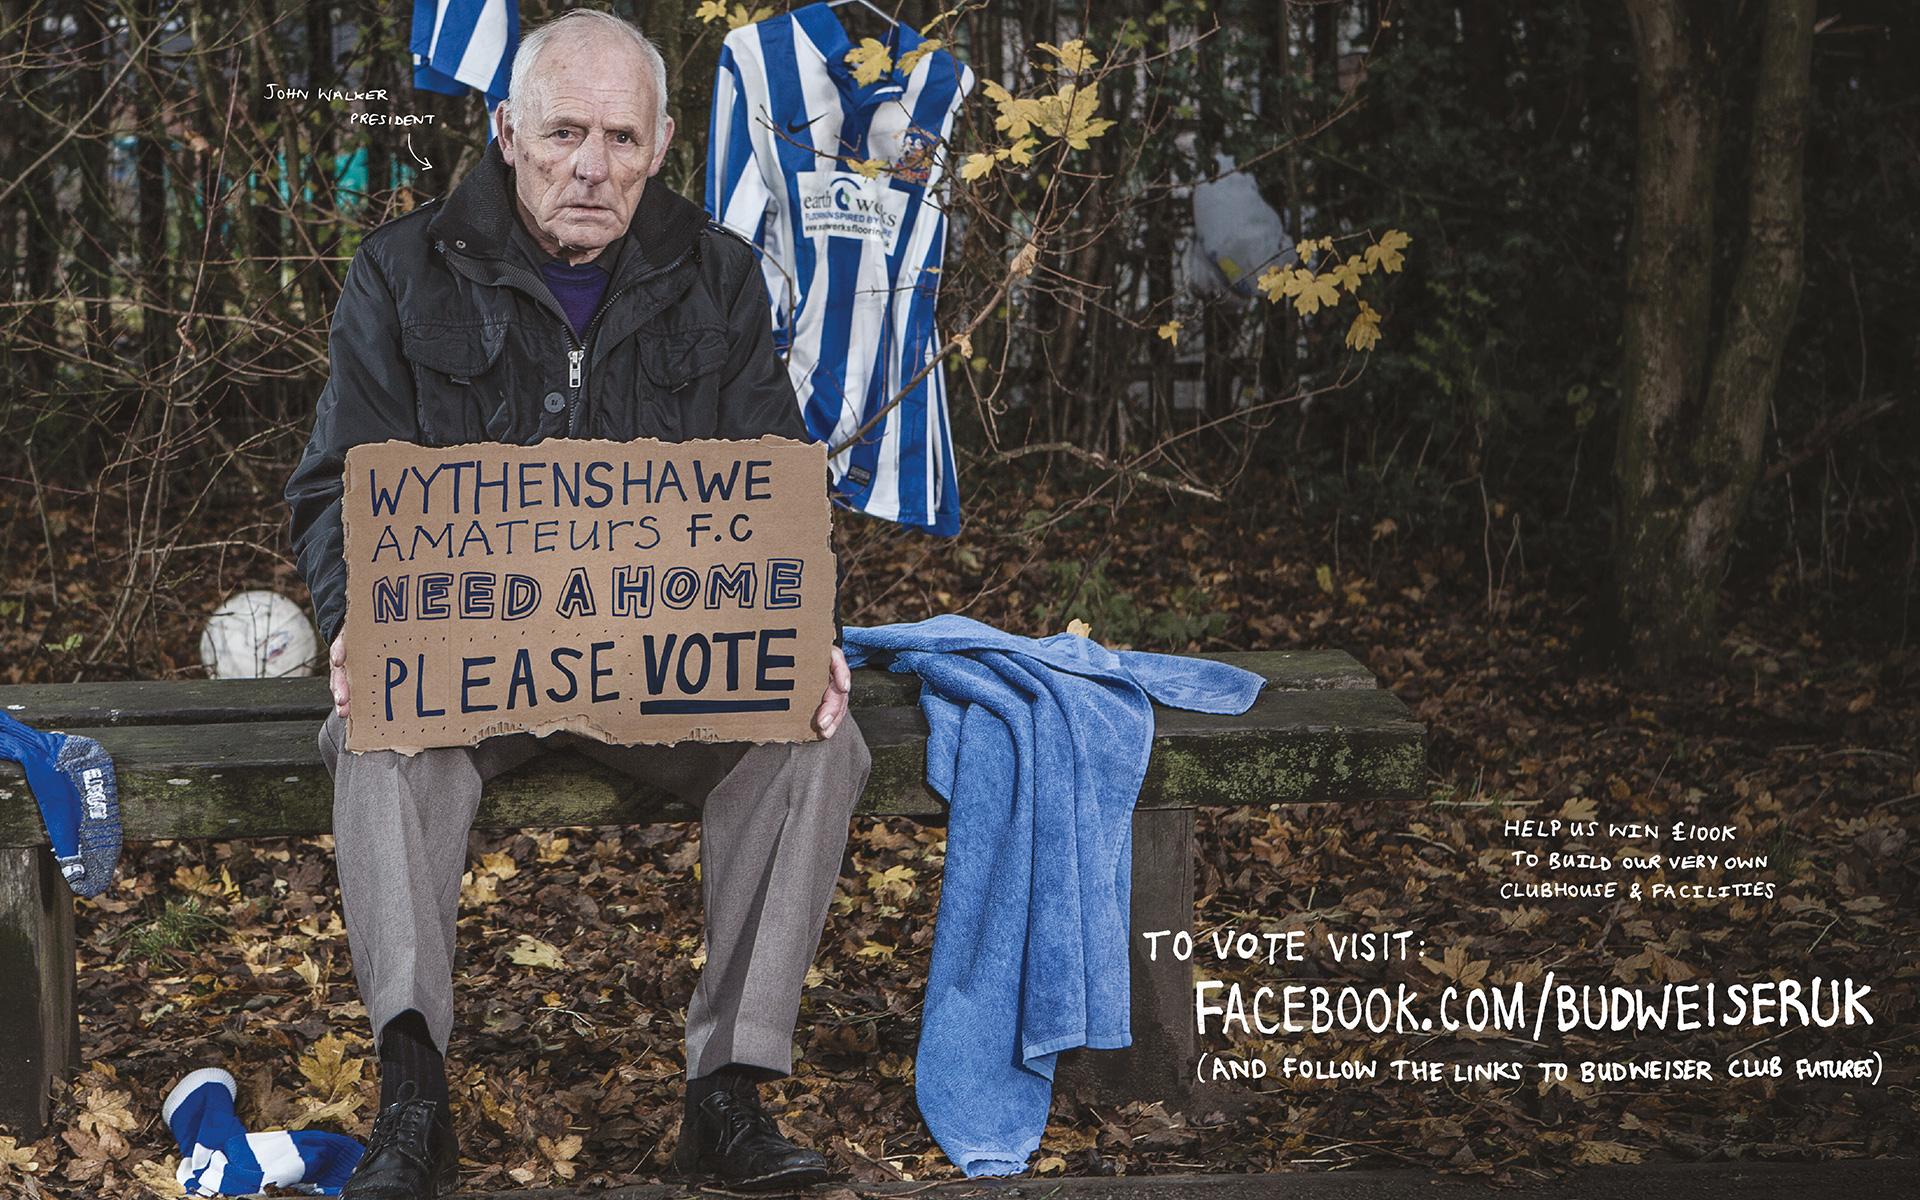 Wythenshawe-Amateurs-Campaign-Advert-Hairdryer